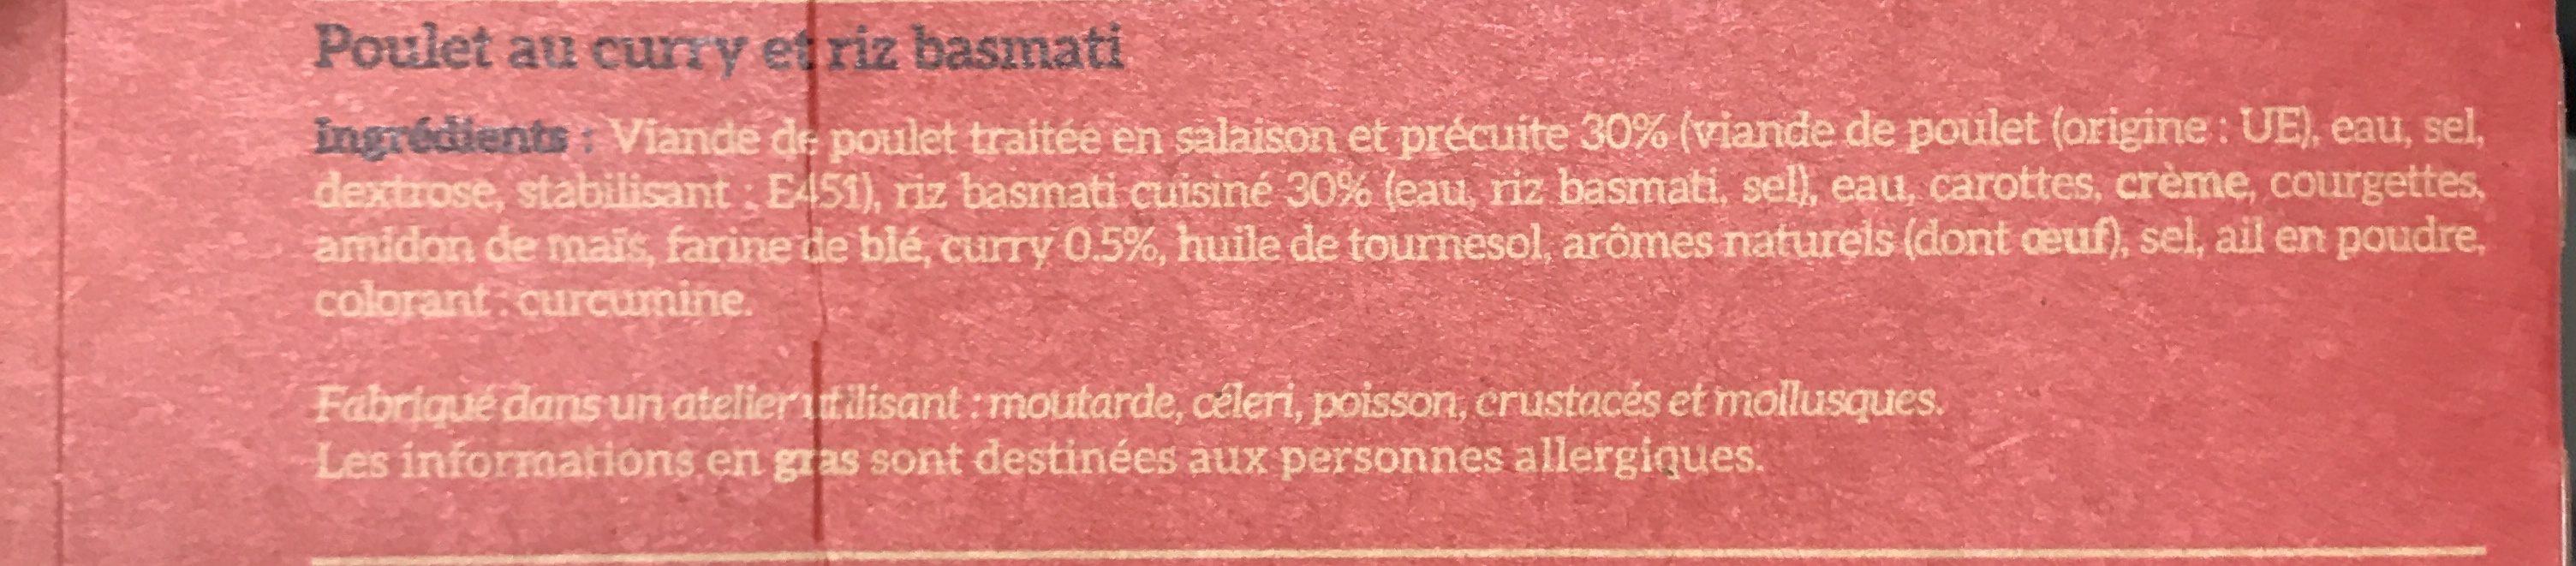 Poulet au curry & riz basmati - Ingredients